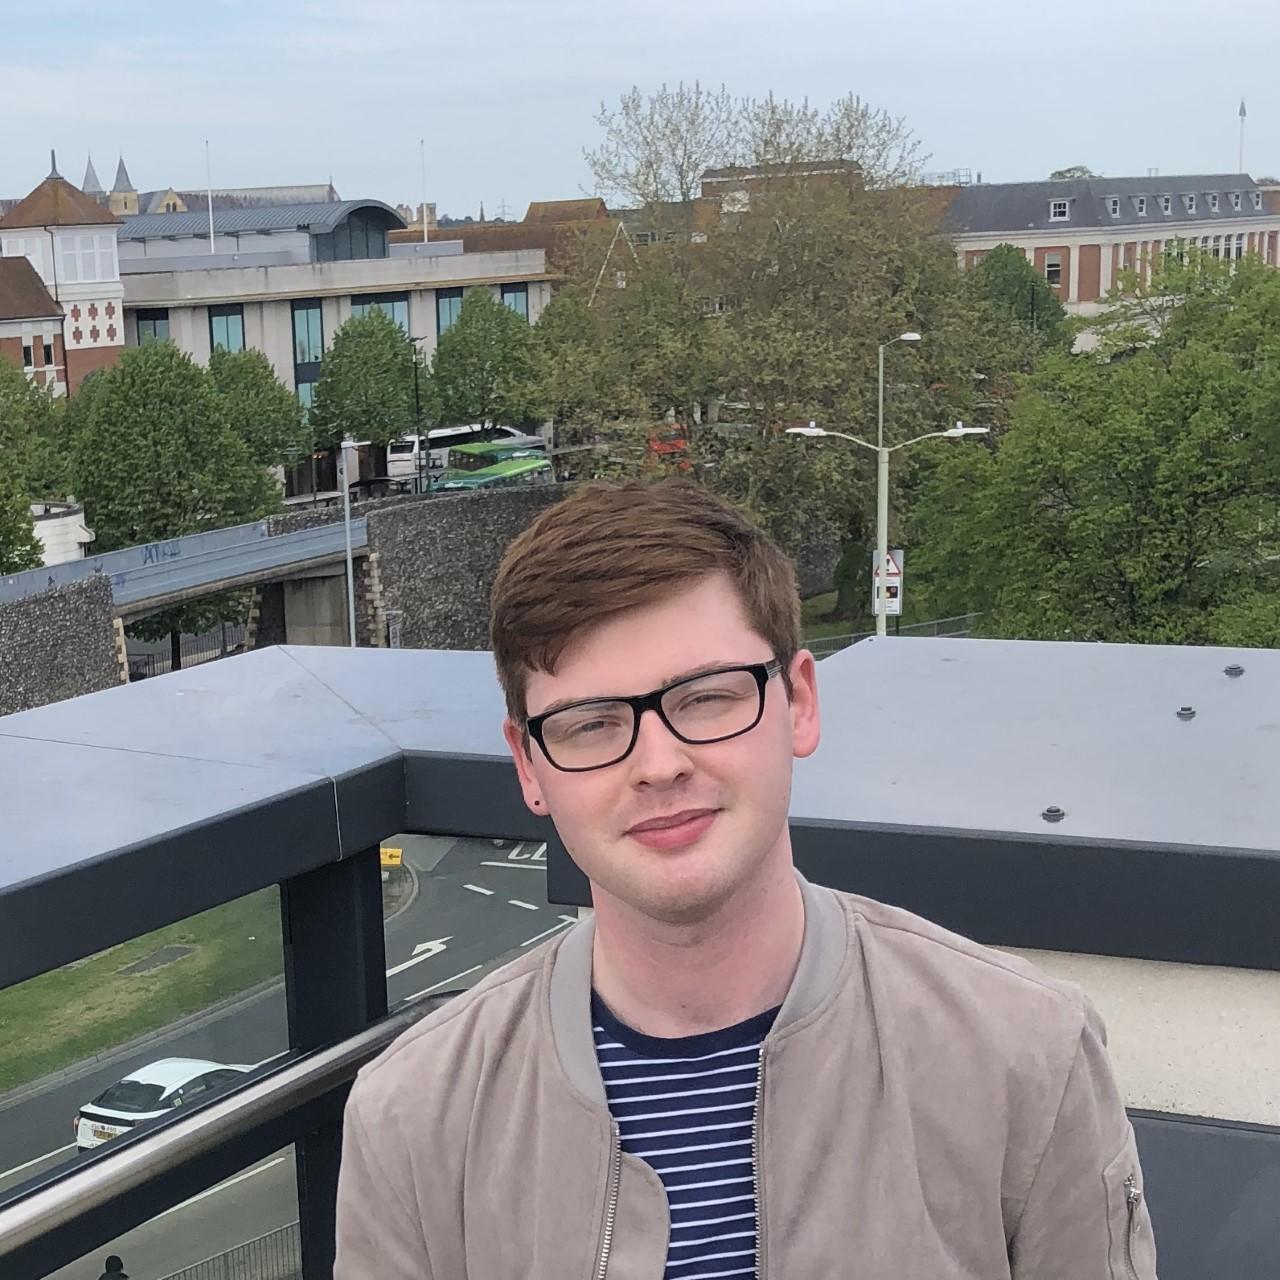 Politics and IR Graduates – Where are they now? John Smith, Civil Service